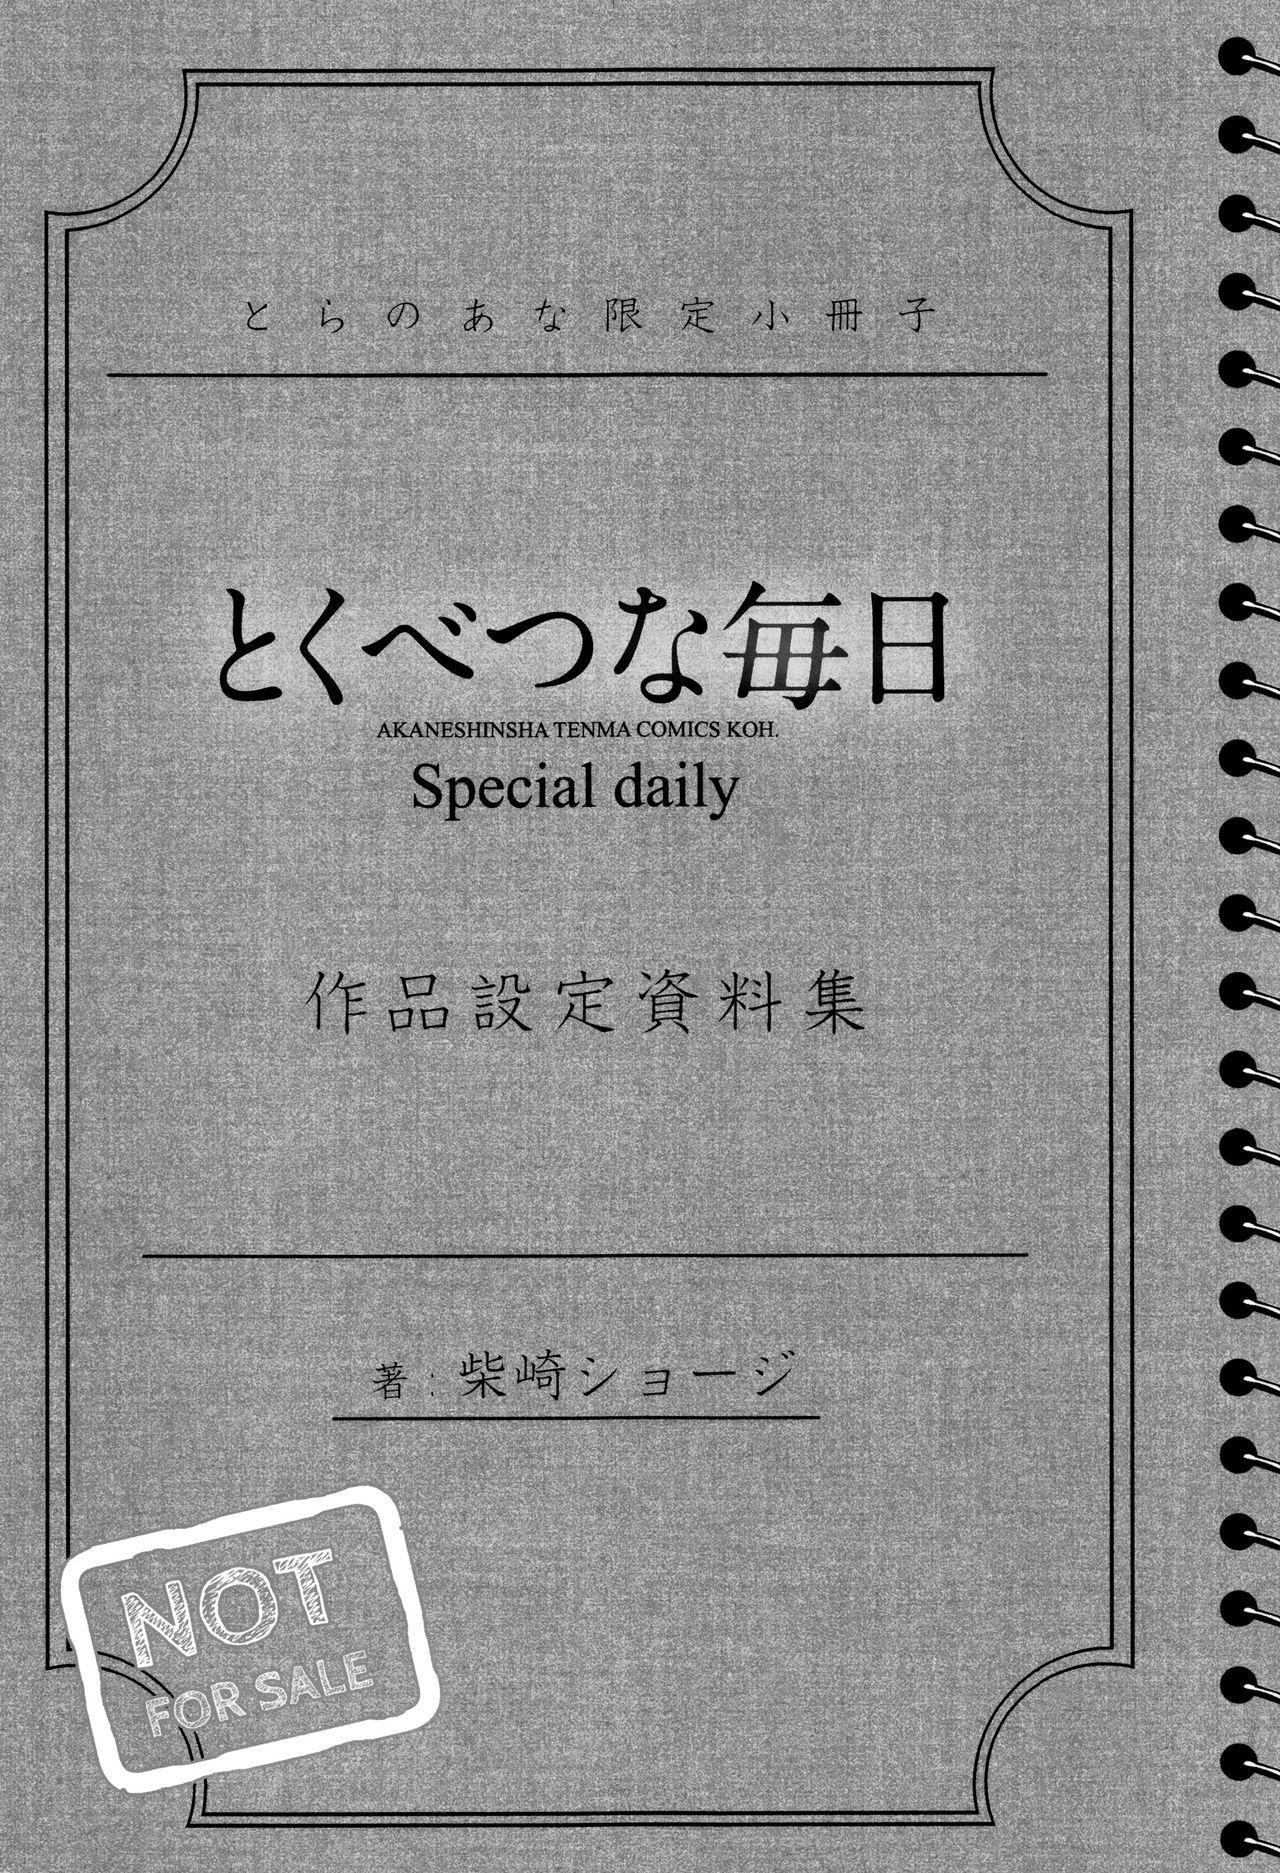 Tokubetsu na Mainichi - Special daily 211